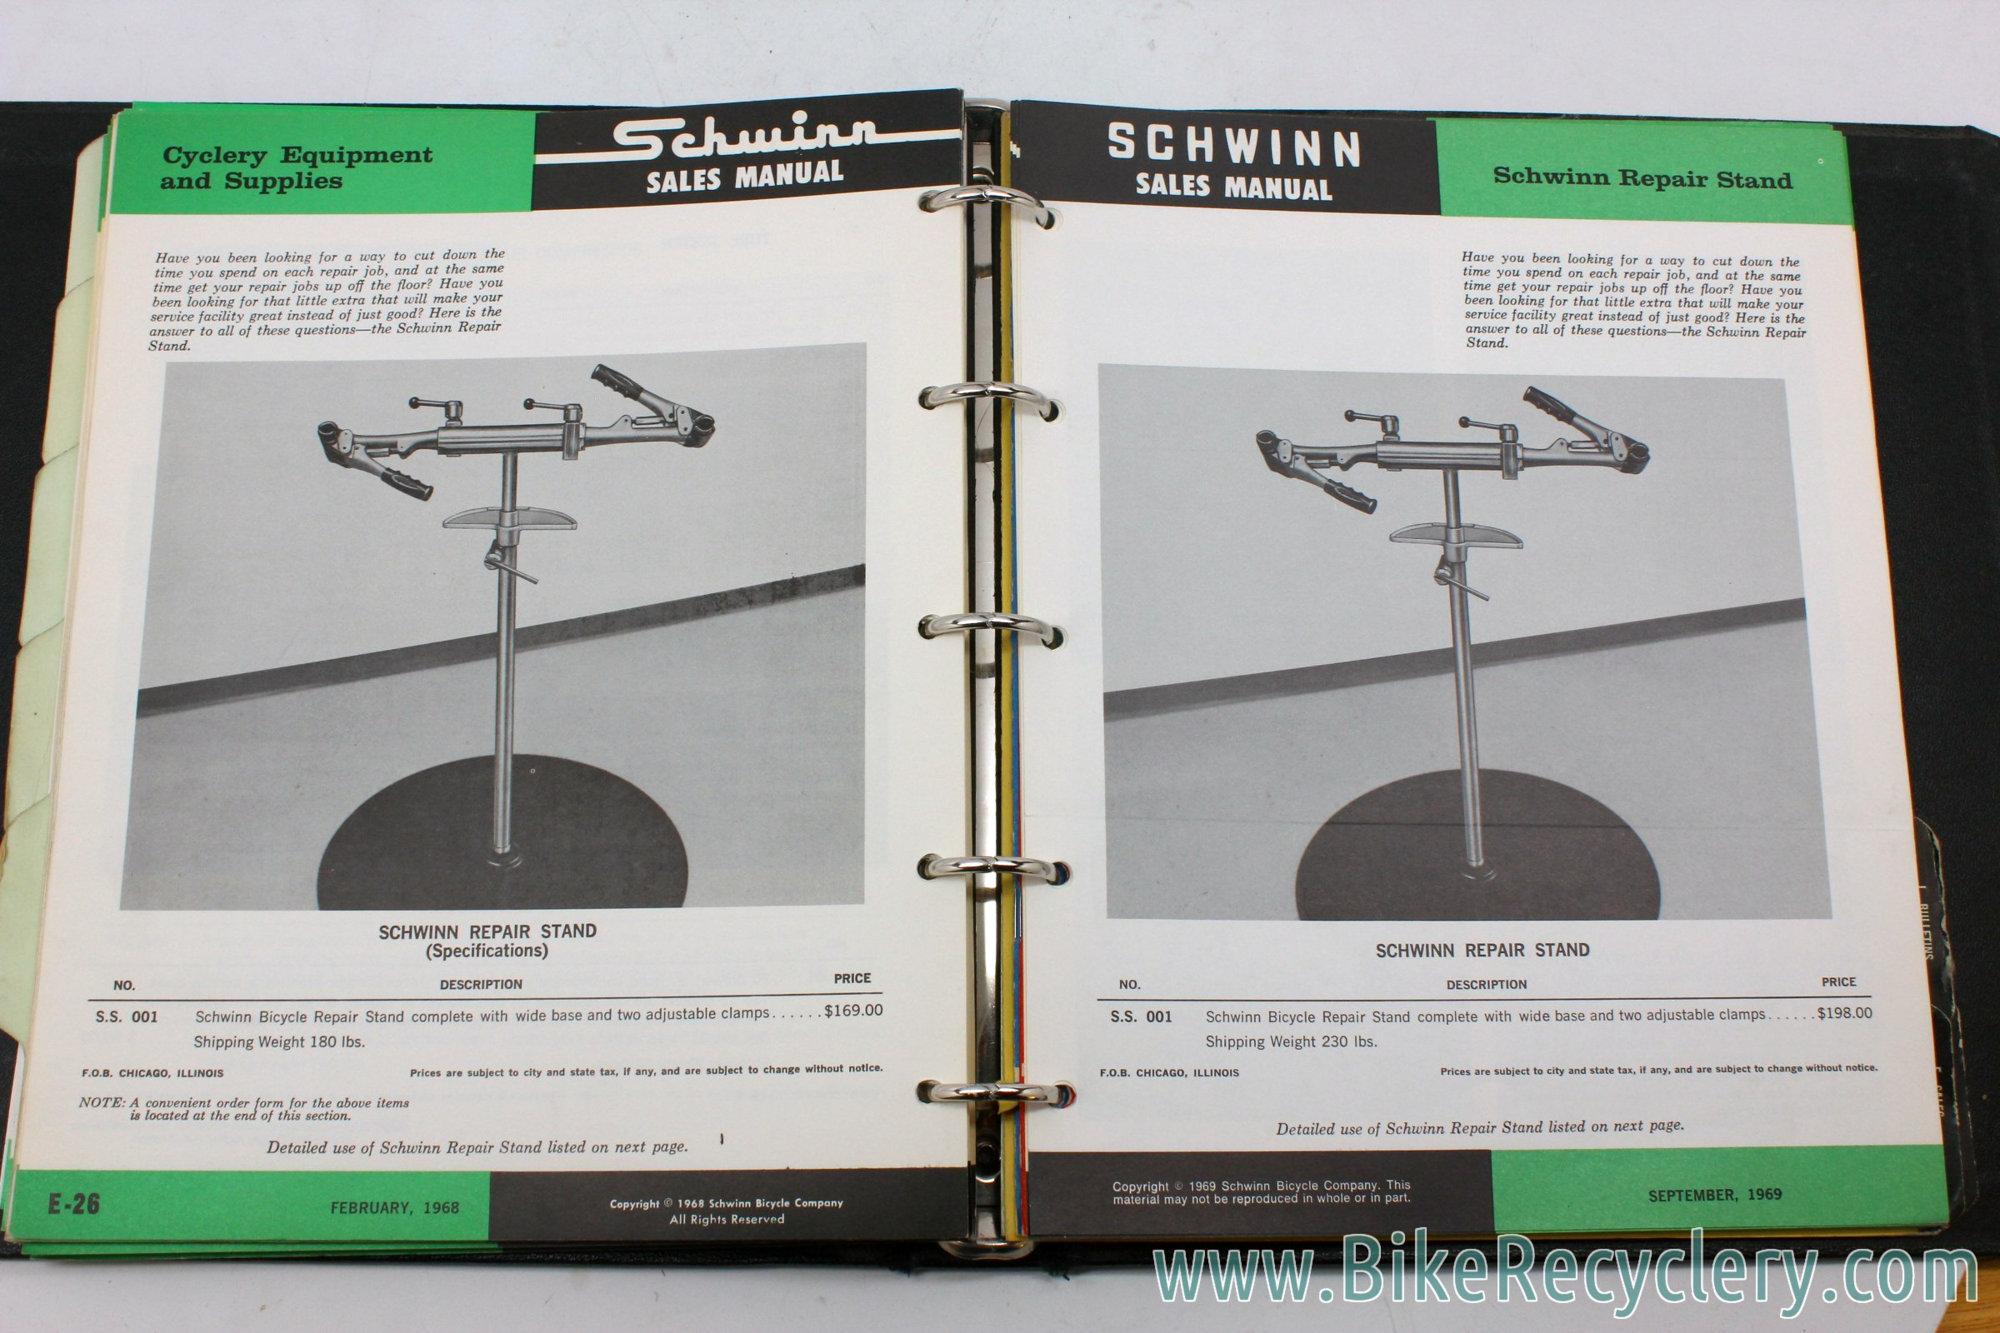 vintage_schwinn_memorabilia_catalogs_dealer_service_manuals_17827.JPG